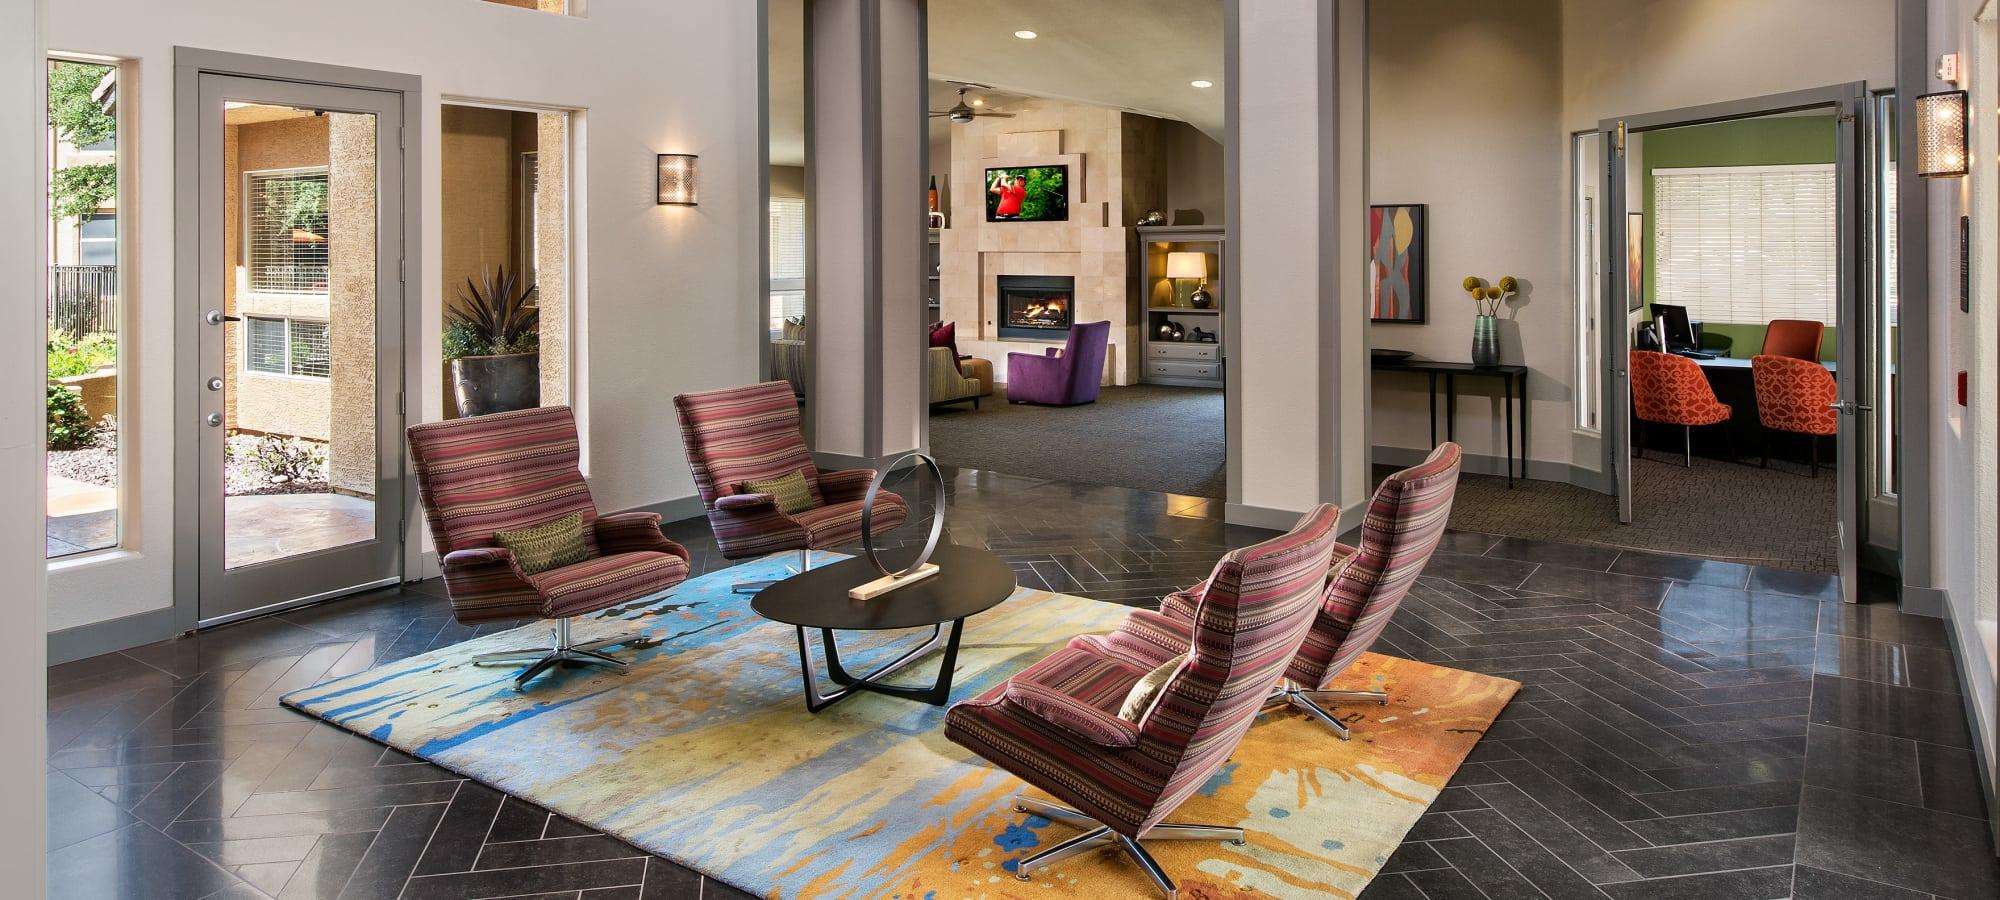 Lobby interior at Bellagio in Scottsdale, Arizona